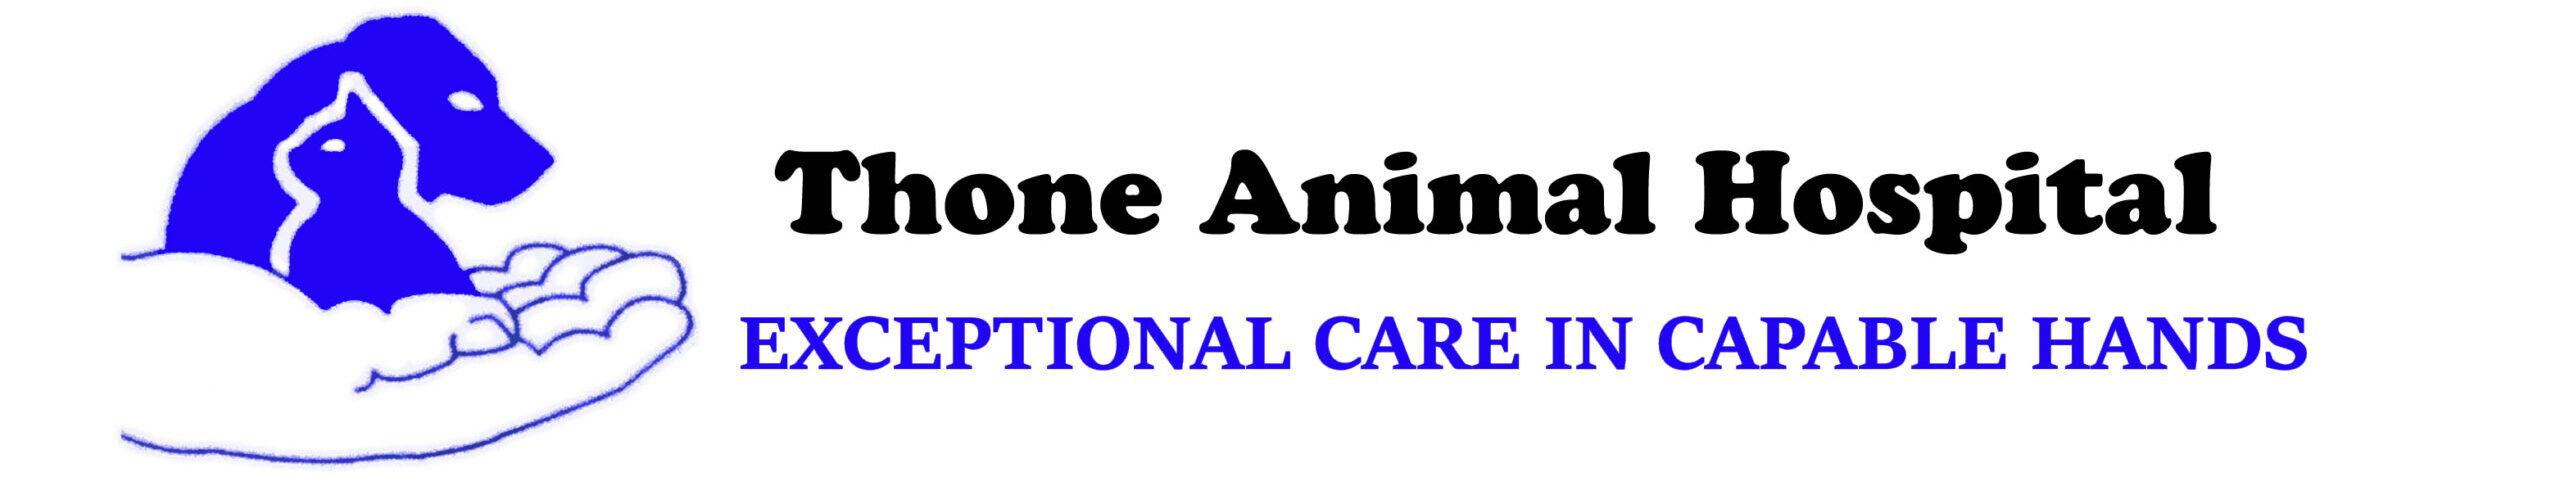 Thone Animal Hospital